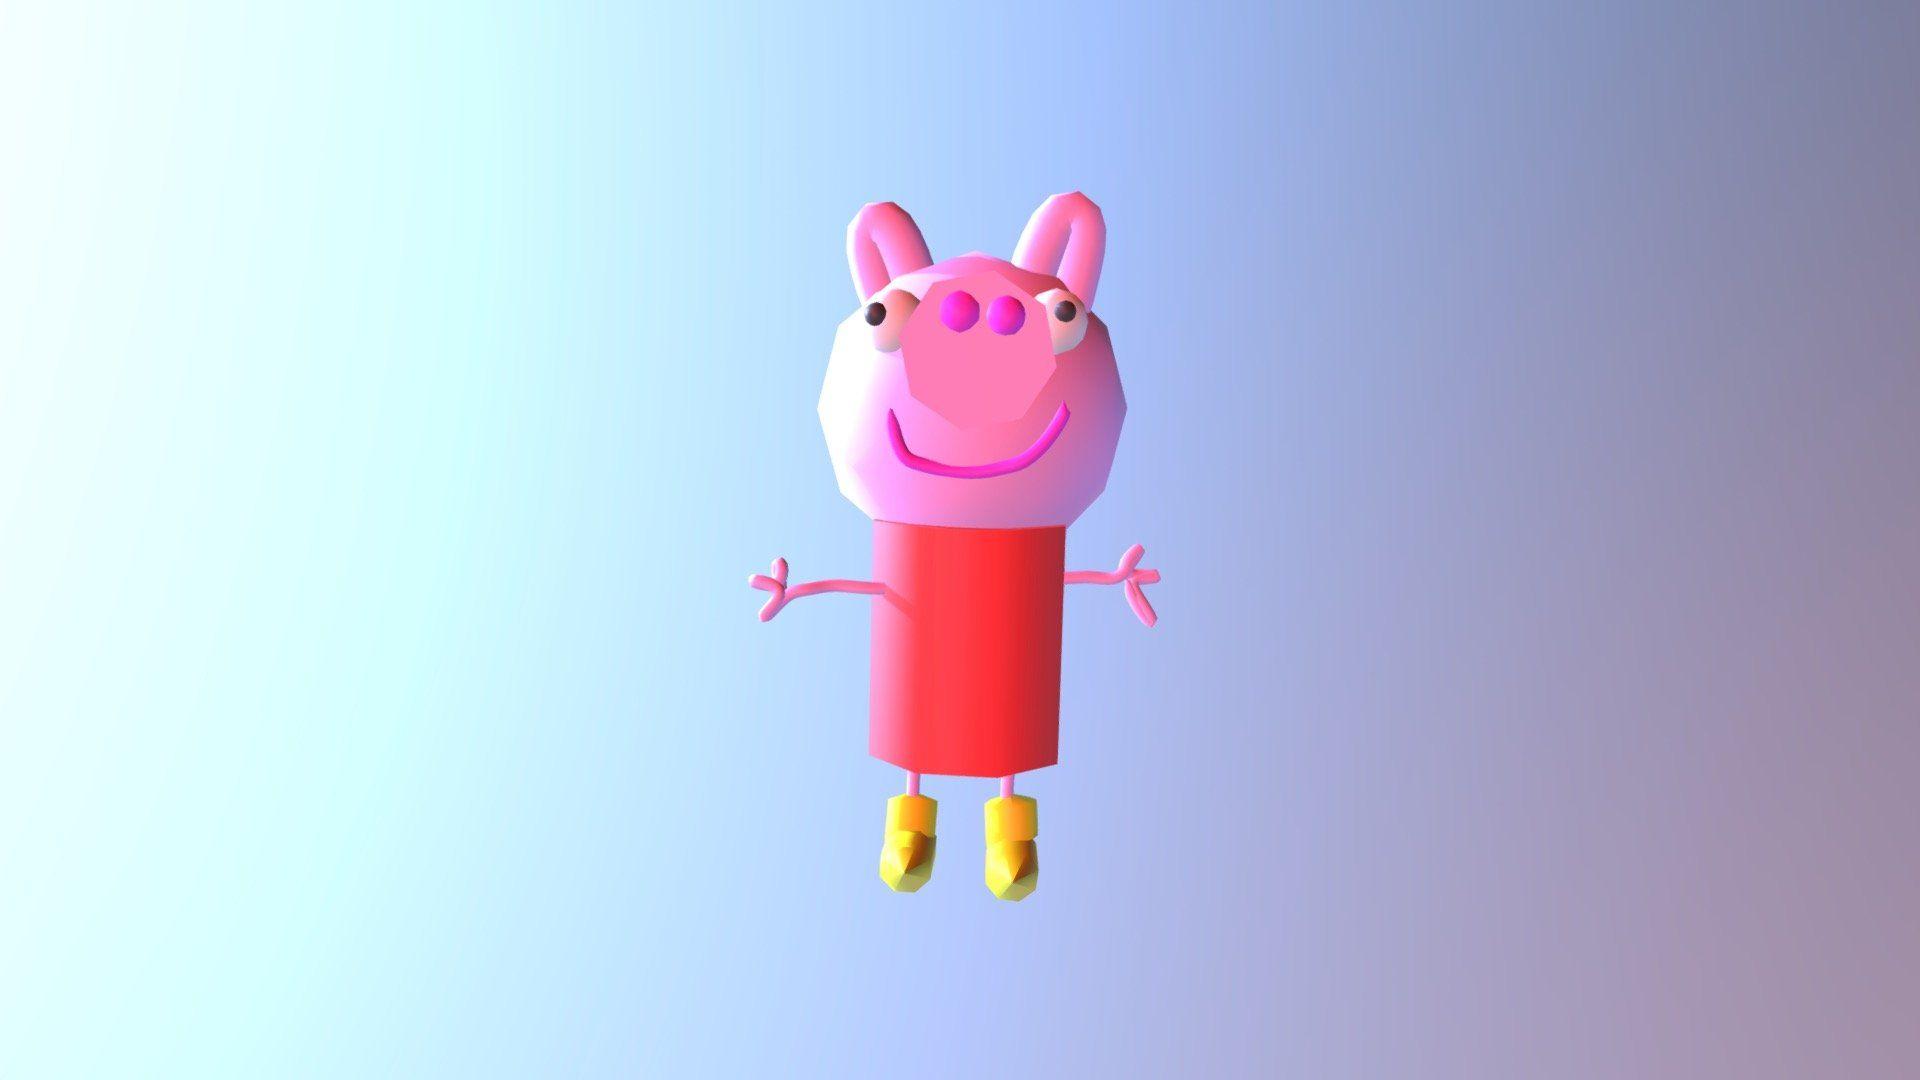 Peppa Pig download nice wallpaper